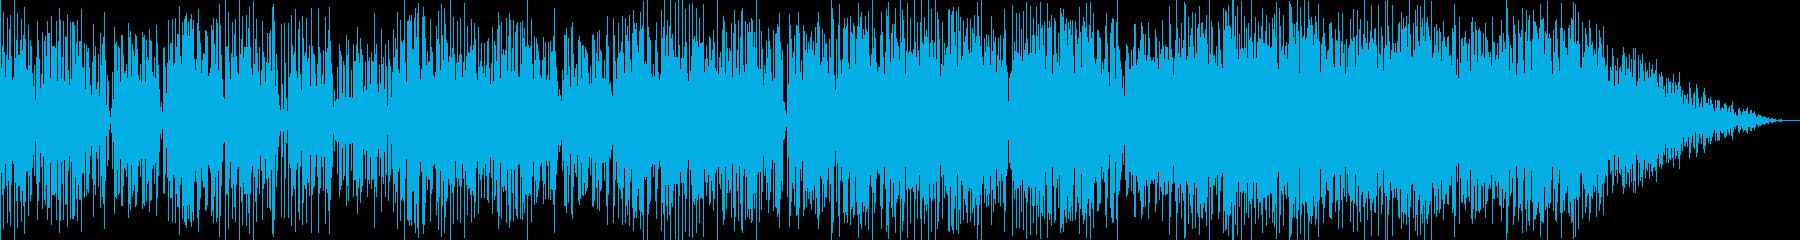 SOTranceのDefault版の再生済みの波形